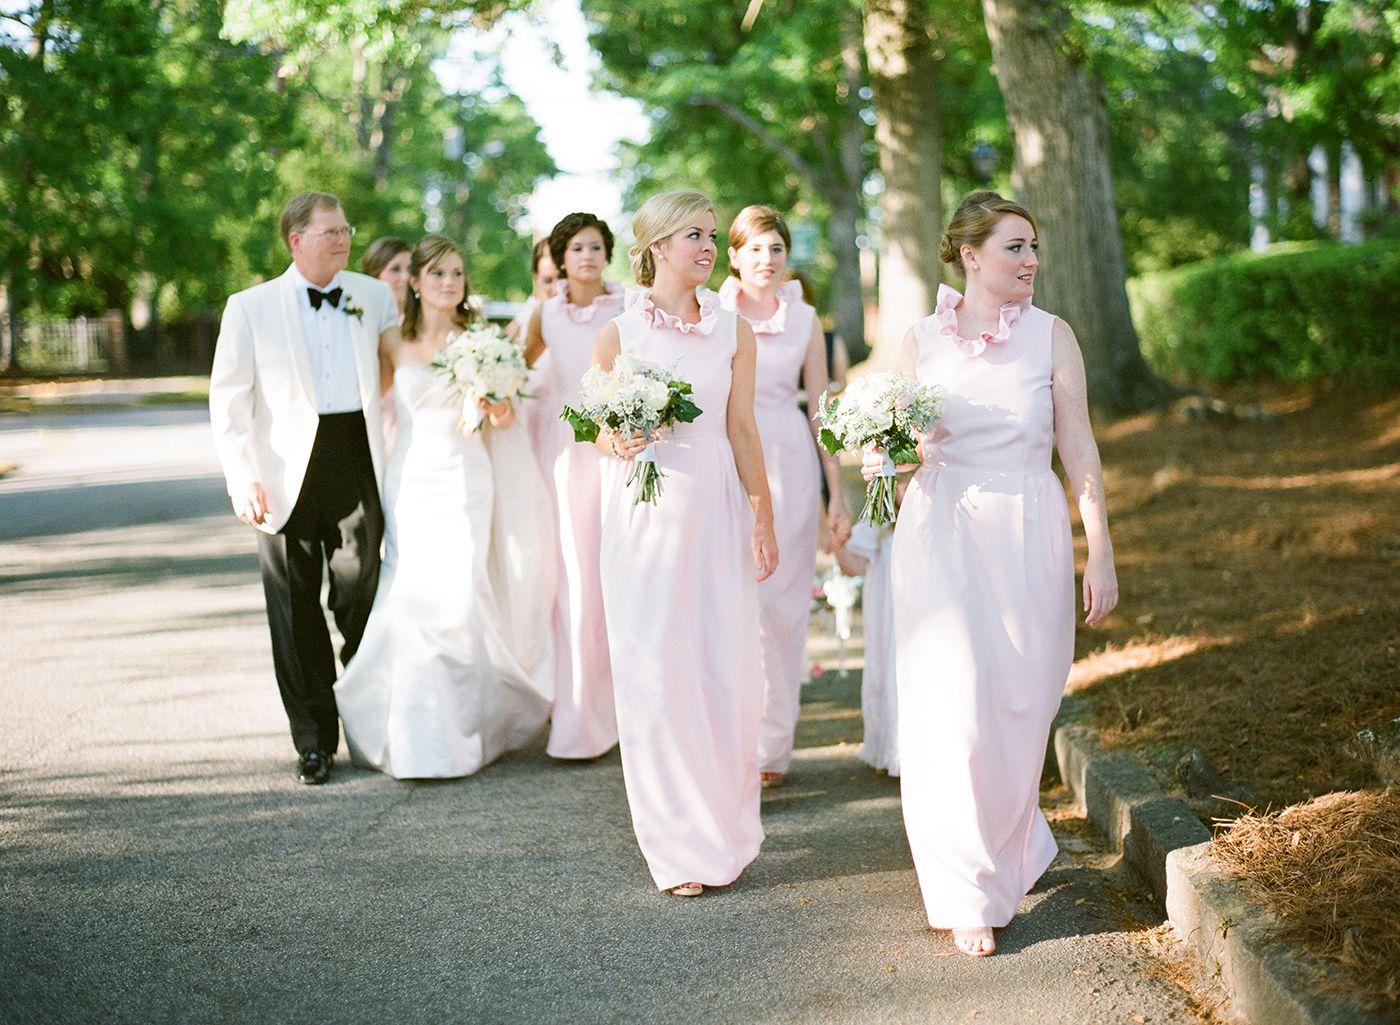 Pink Bridesmaids Dresses By Camilyn Beth. Augusta, GA Wedding.